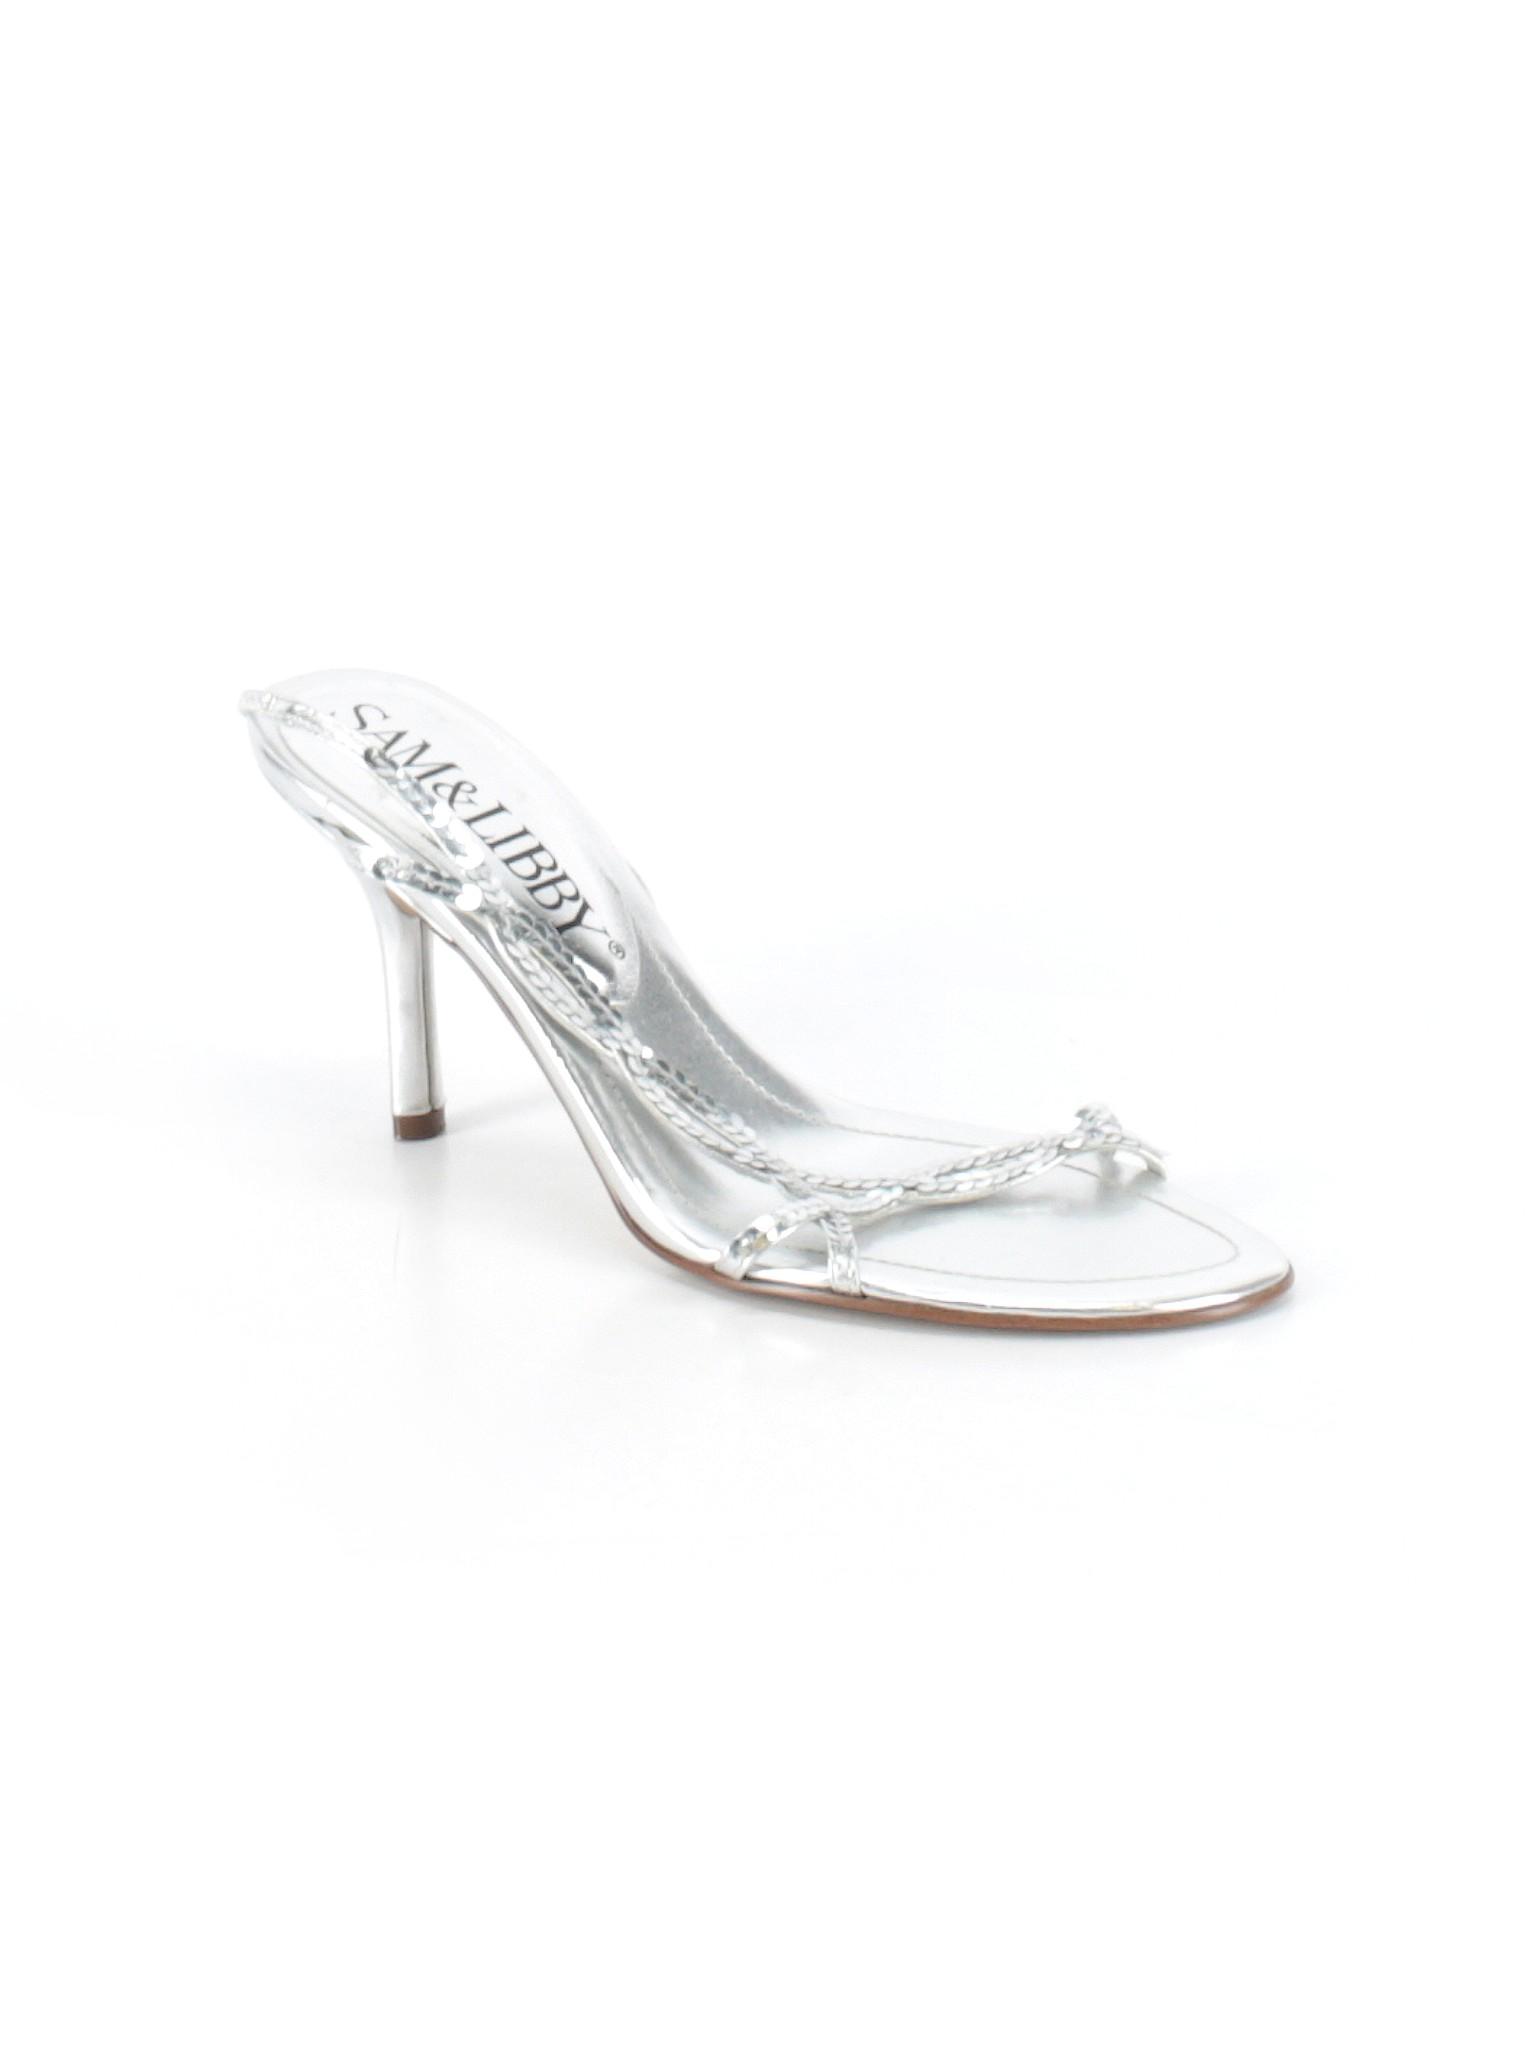 Sam promotion Boutique Heels amp; Libby C15qw5